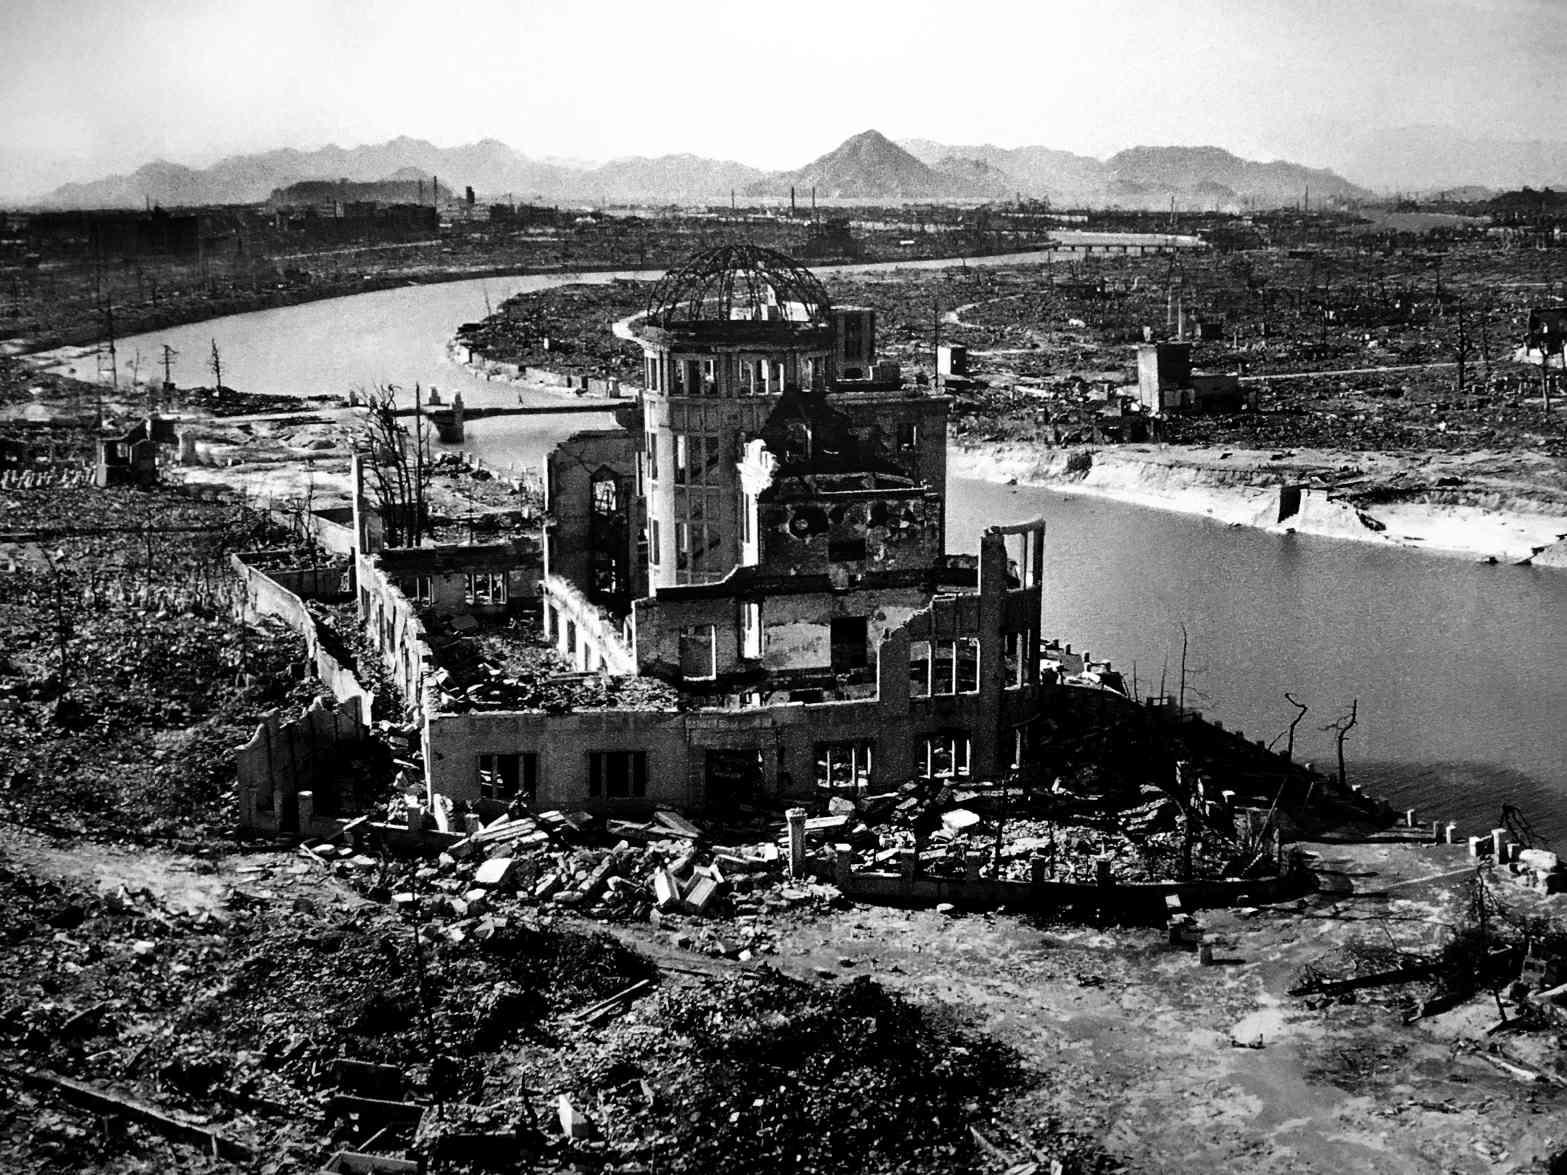 The Hiroshima Peace Memorial Museum